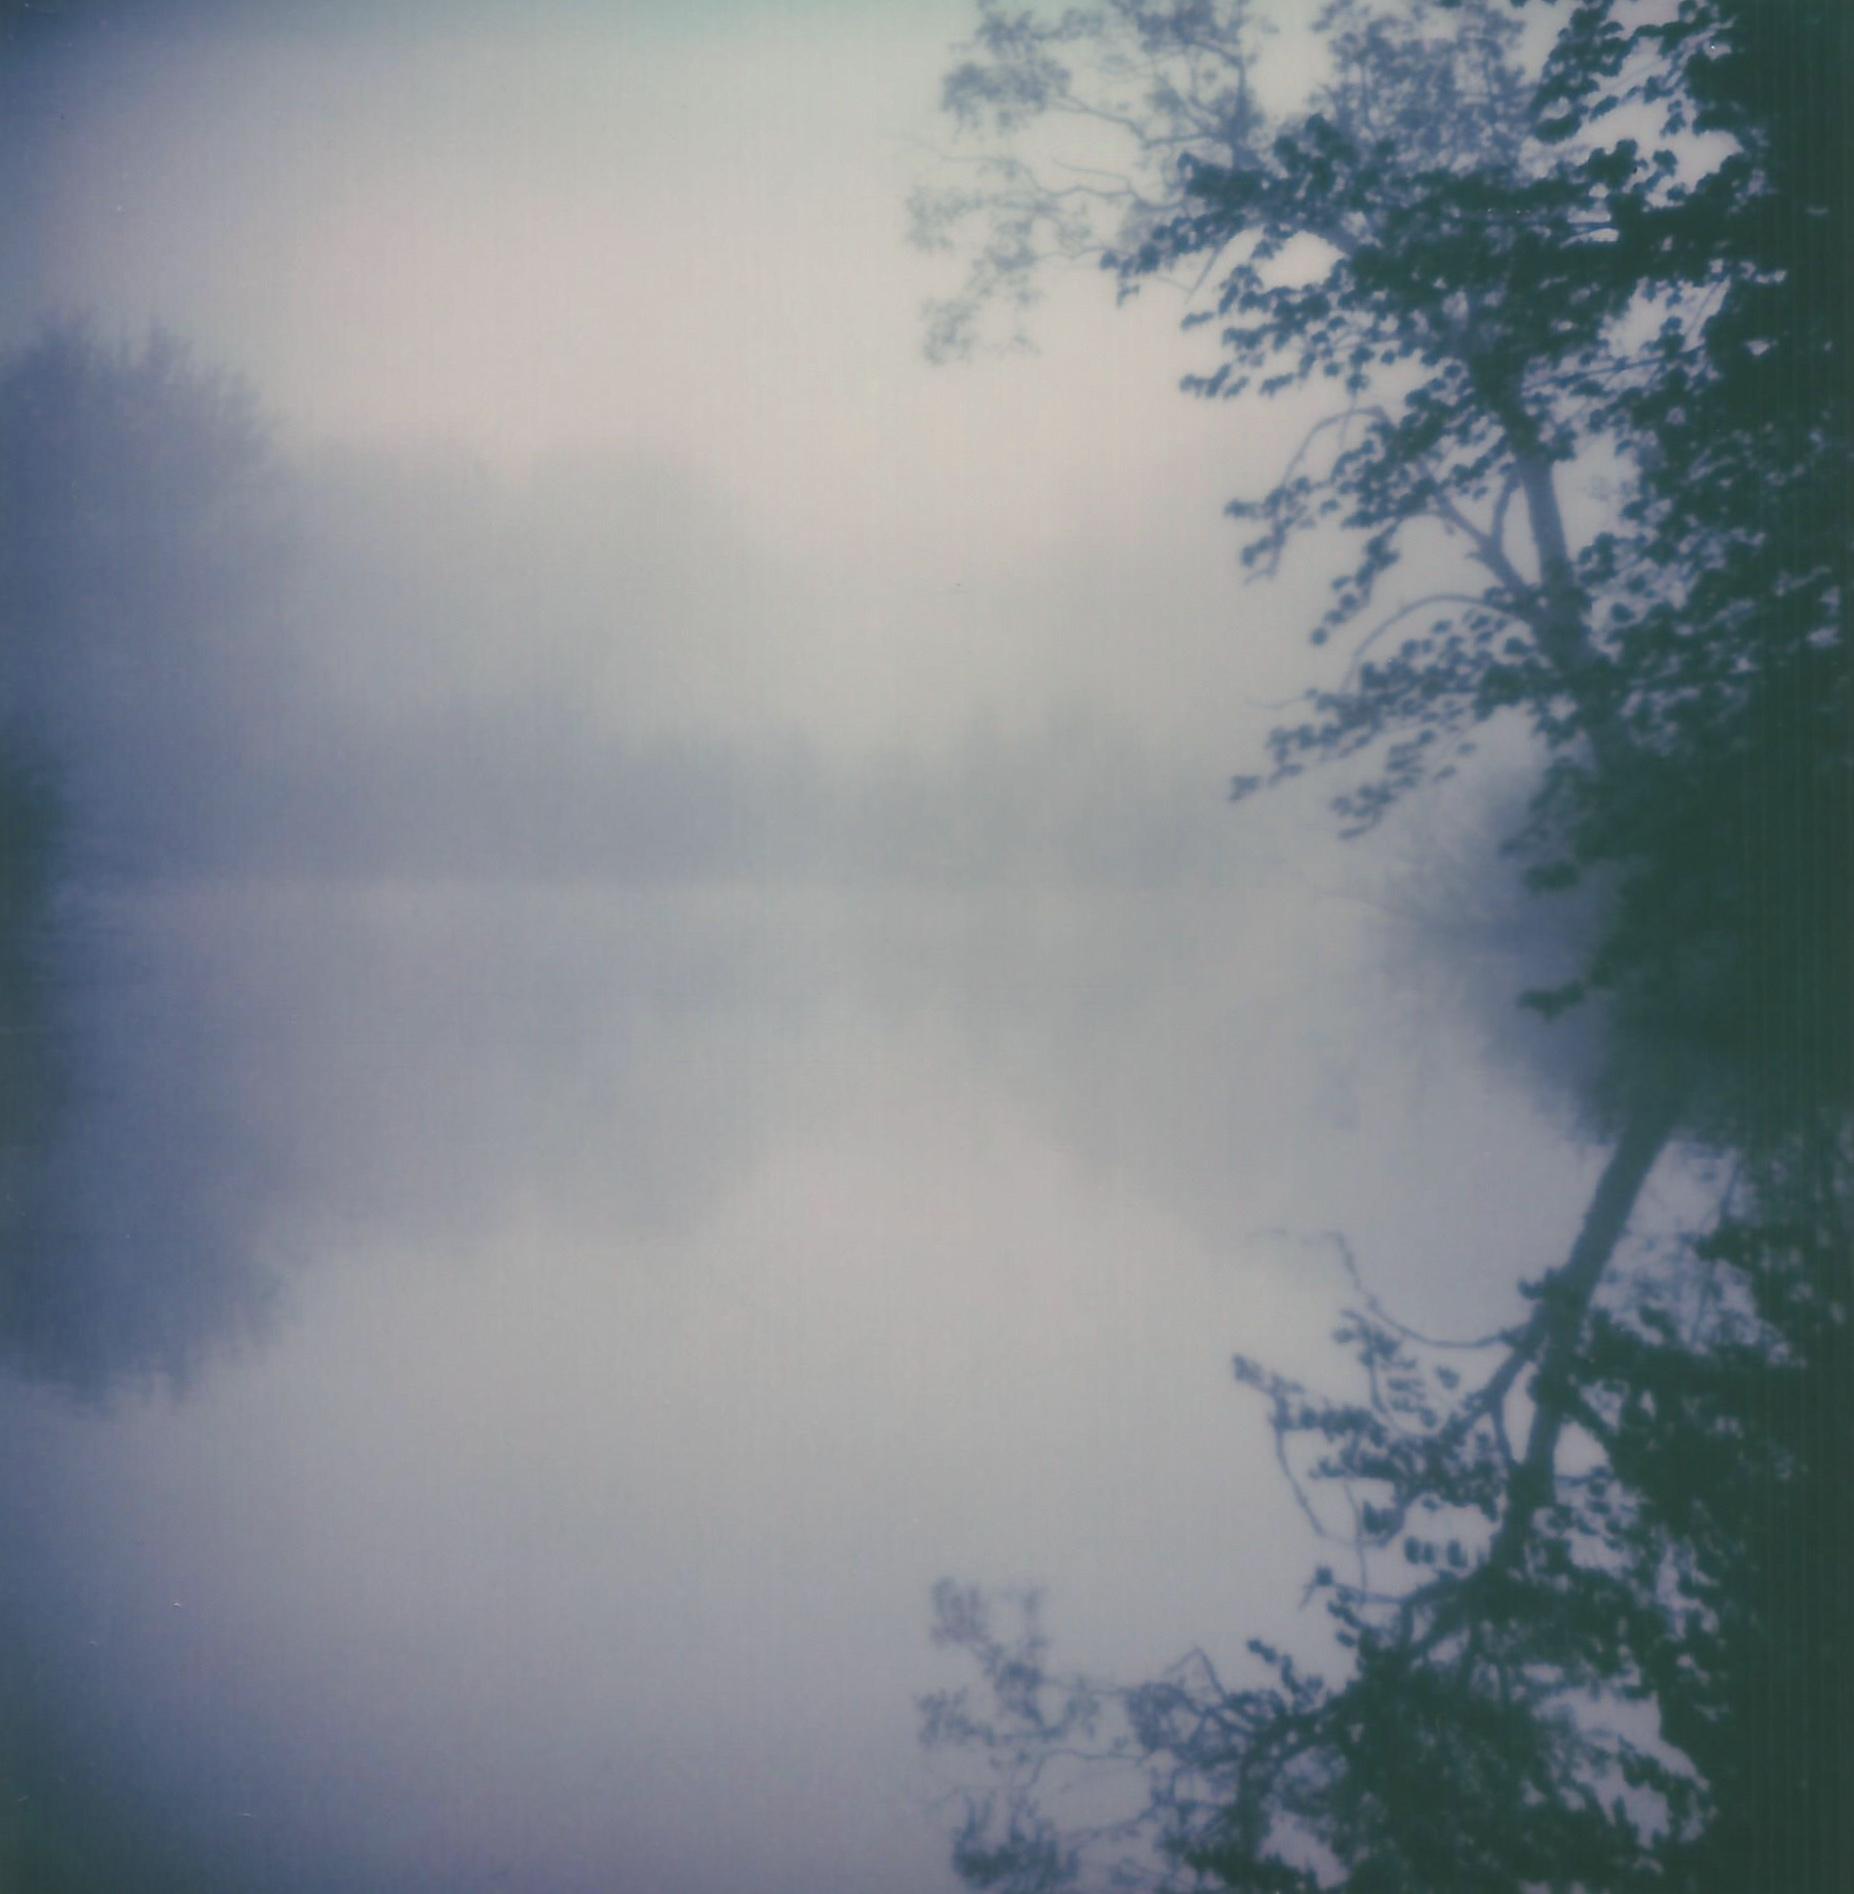 Fog On The River | Polaroid SLR680 | Polaroid Originals Color 600 | Kristin Randall